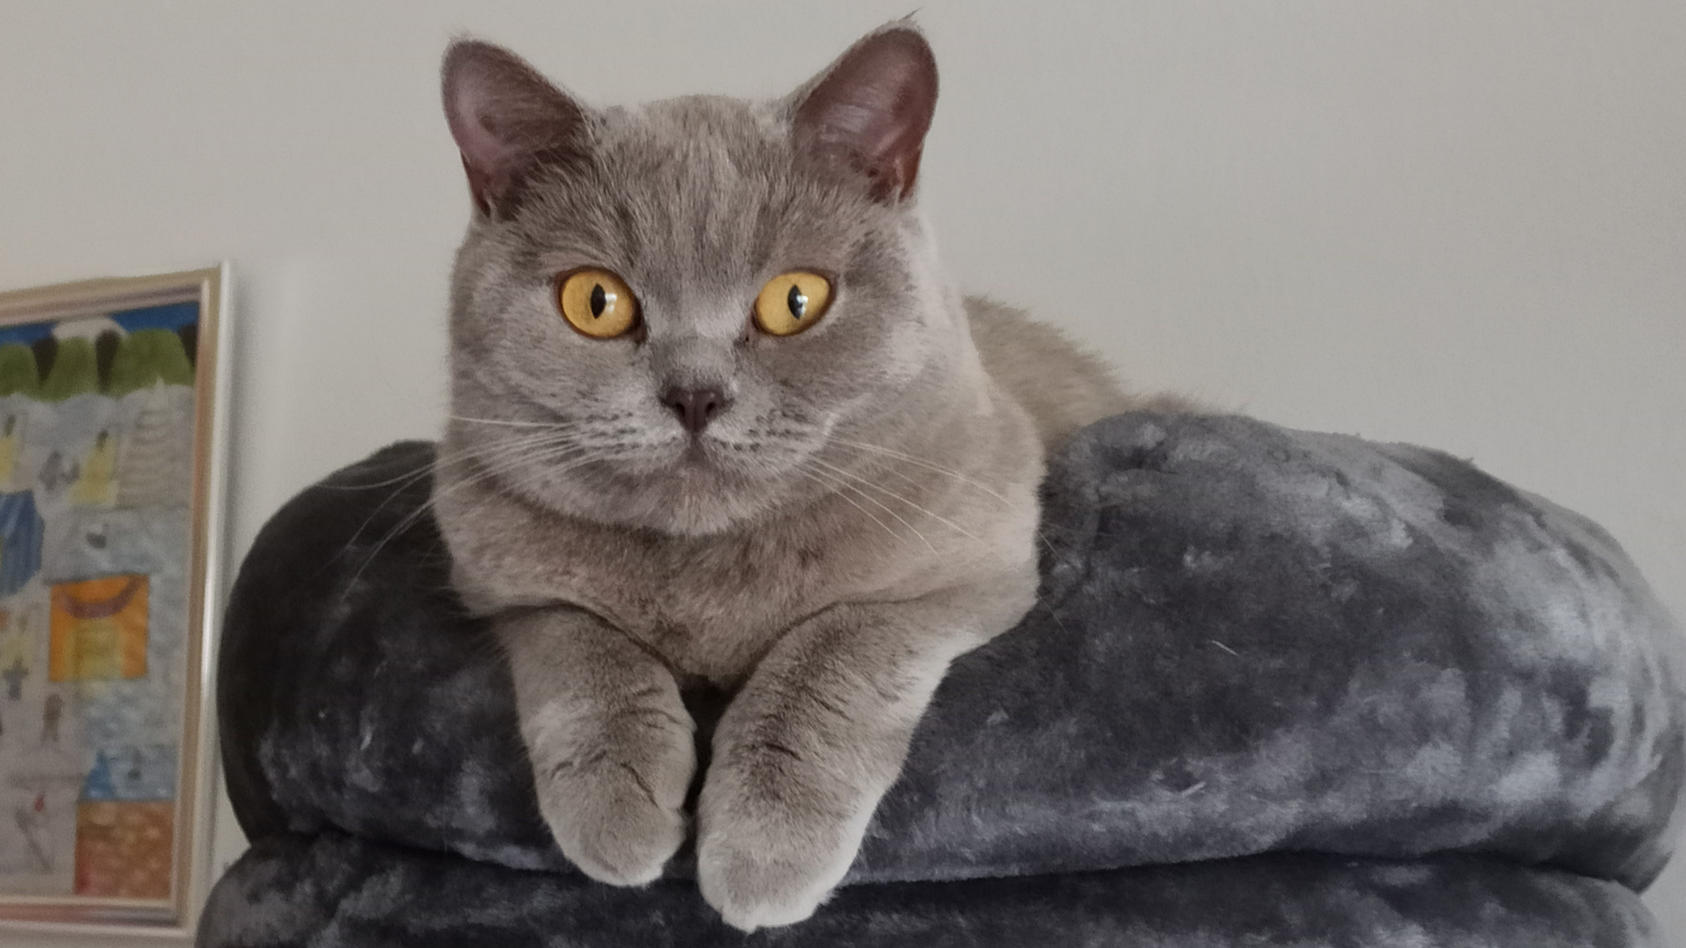 Katze Charly war 10 Monate verschollen.